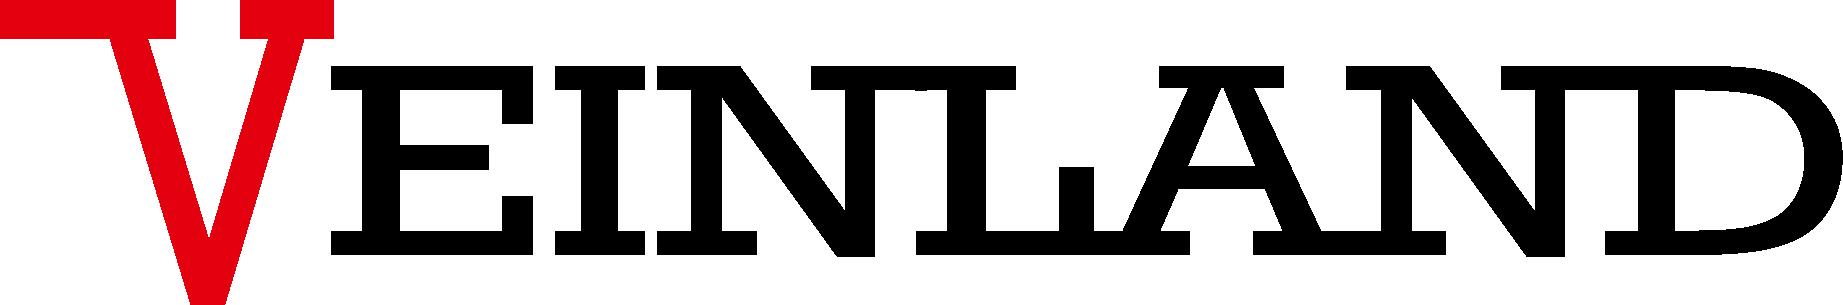 VEINLAND GmbH Logo Pressematerial